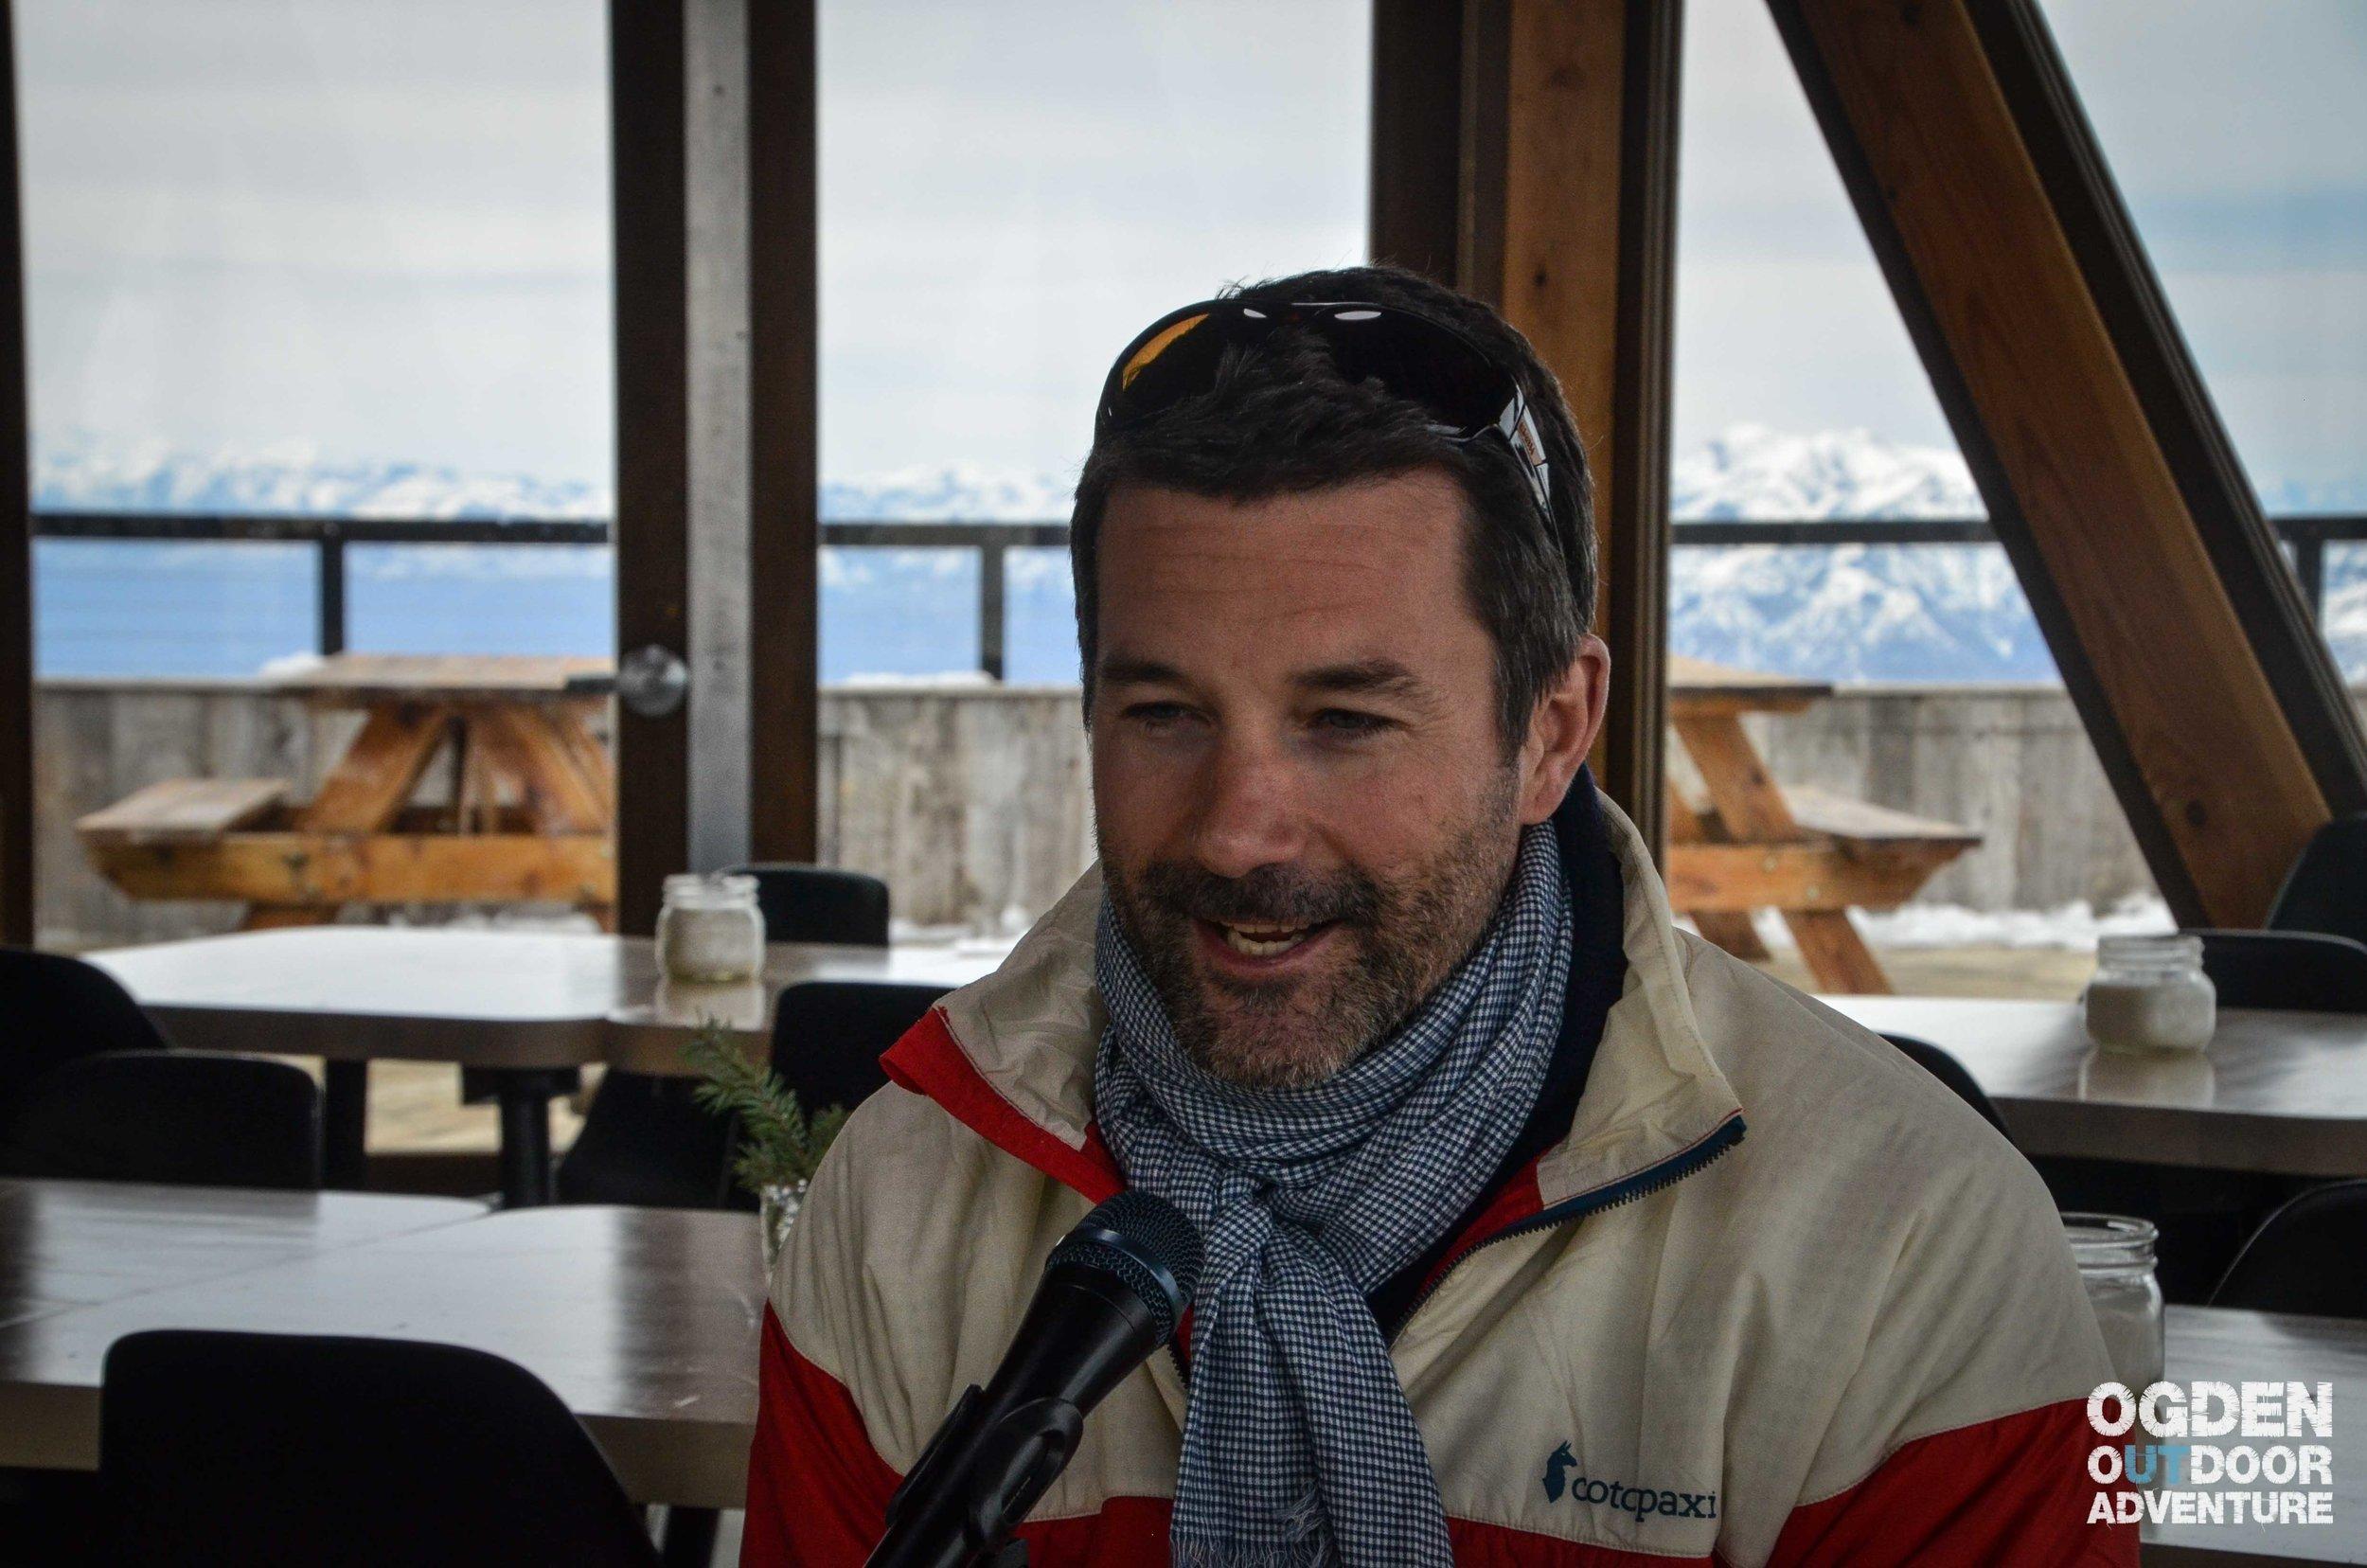 Daniel Fox at Summit Powder Mountain Skylodge